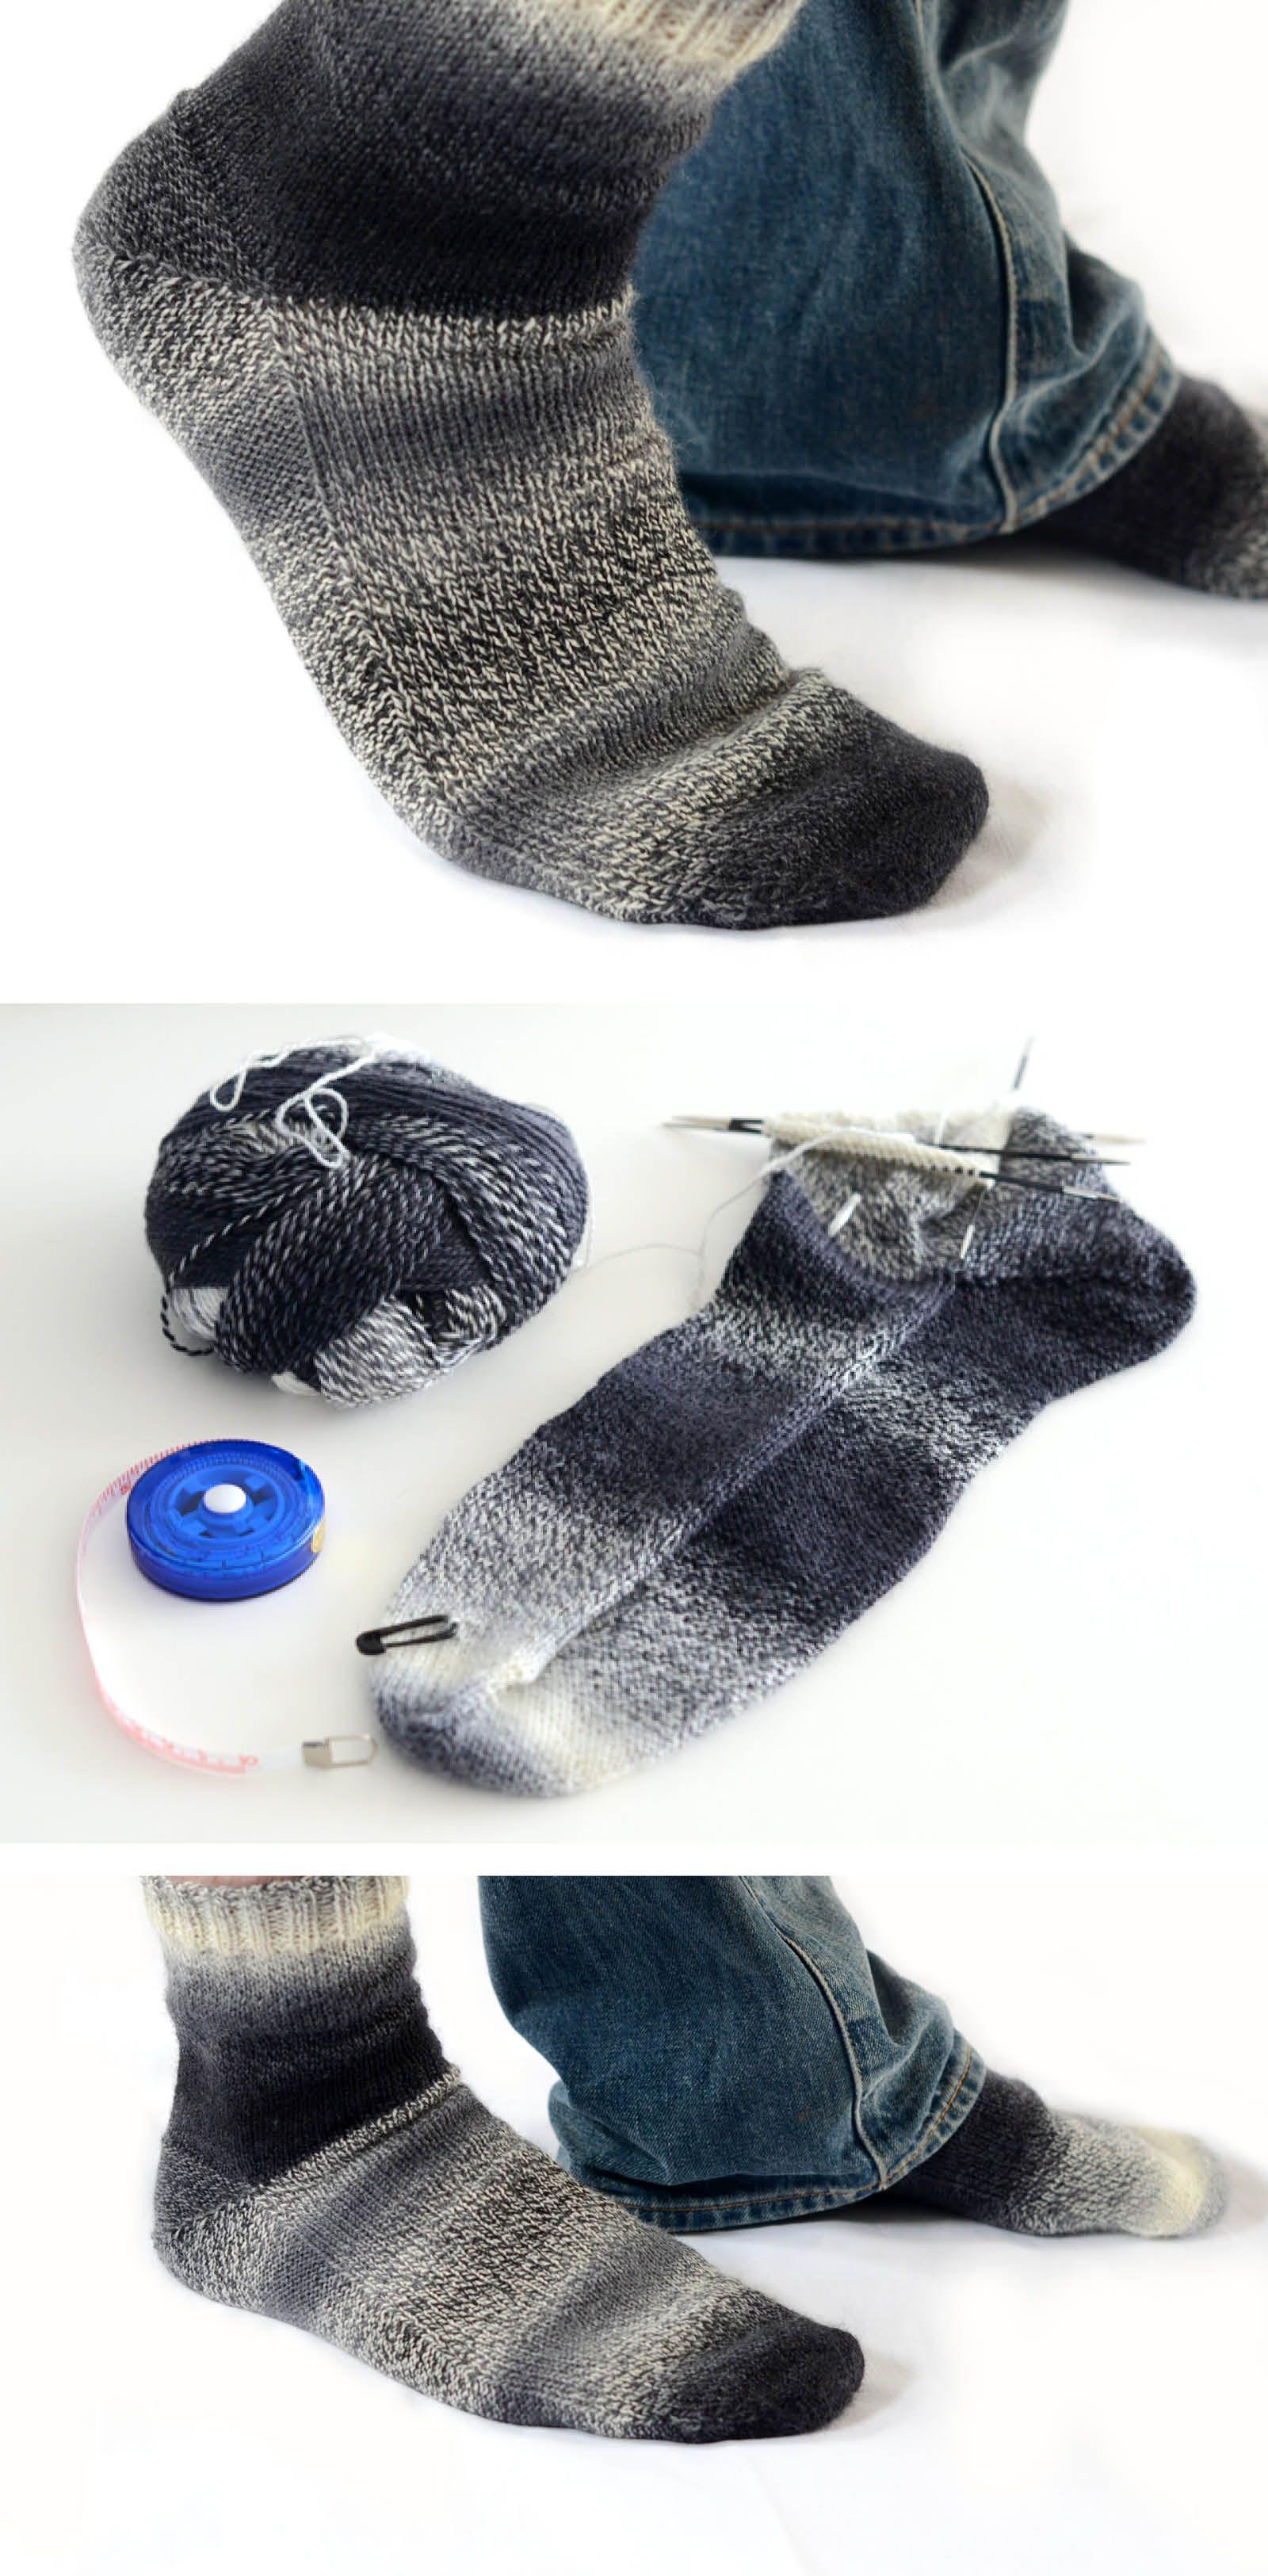 Wintersmith socks knitting pattern for socks with princess soles wintersmith socks knitting pattern for socks with princess soles and a short row heel bankloansurffo Images